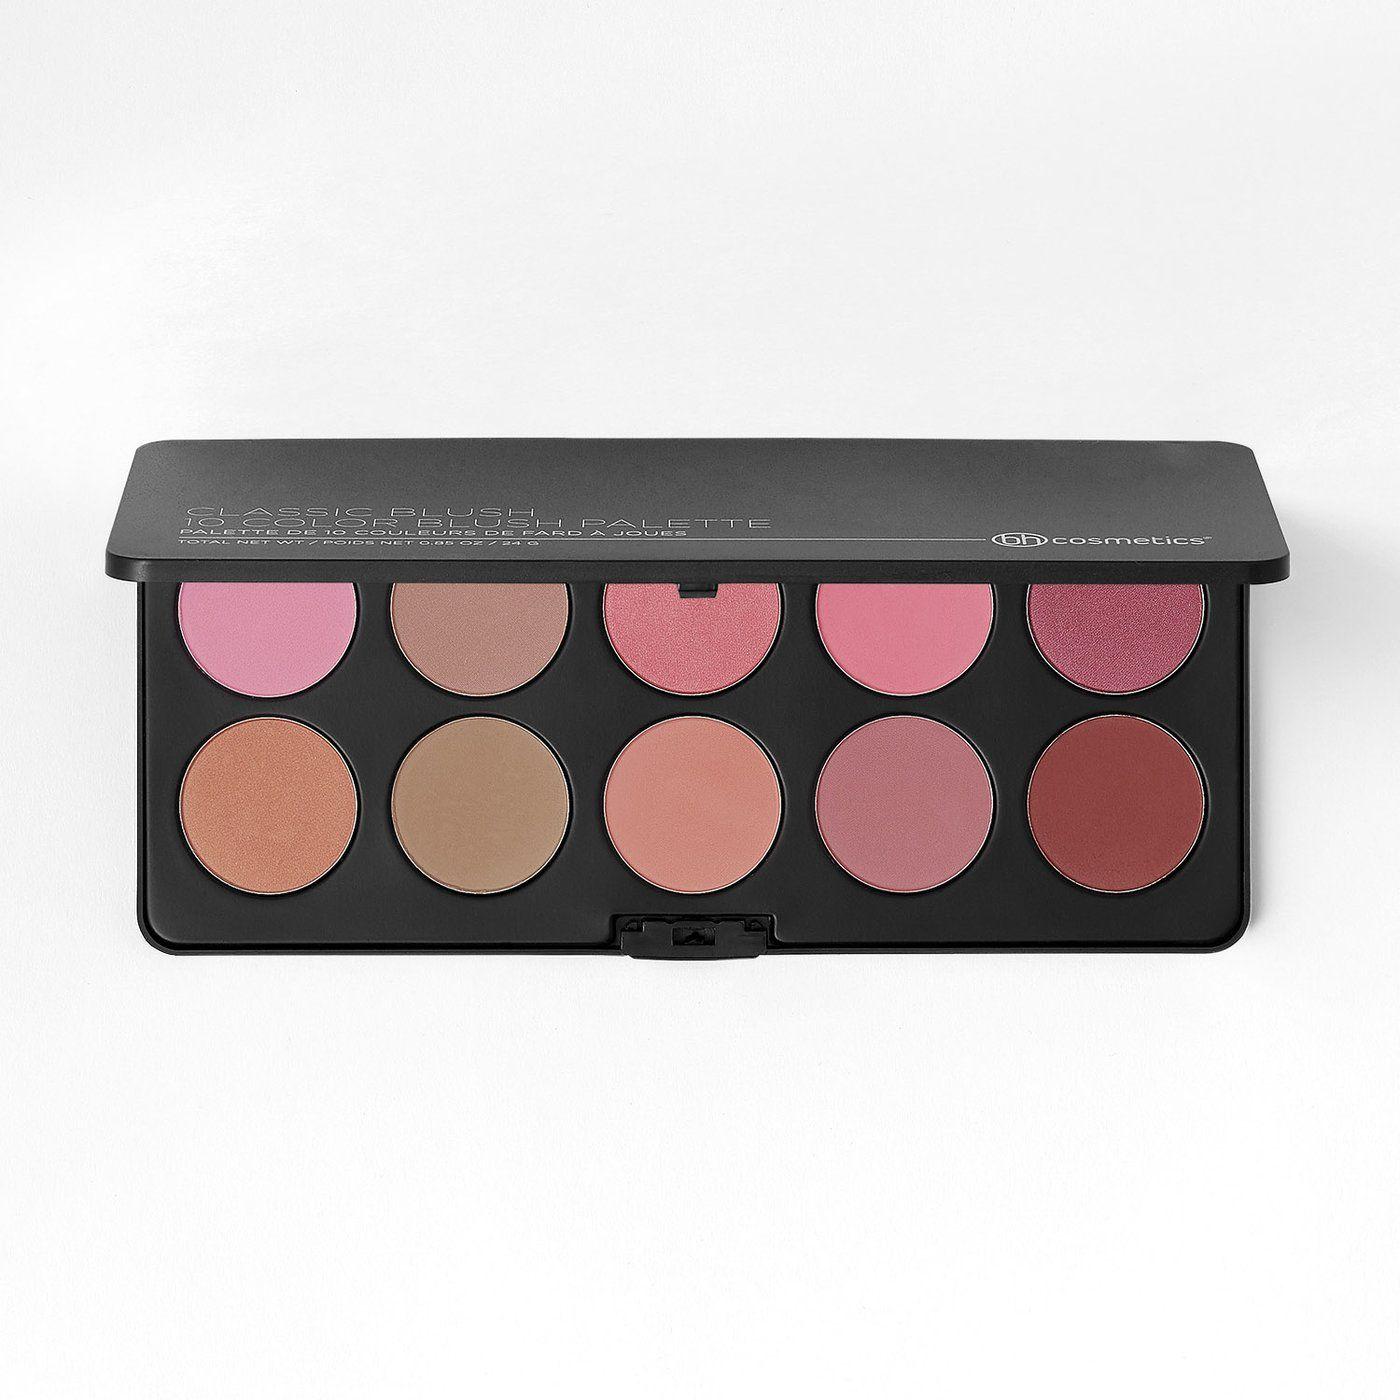 Paleta de Blush Clássico | BH Cosmetics